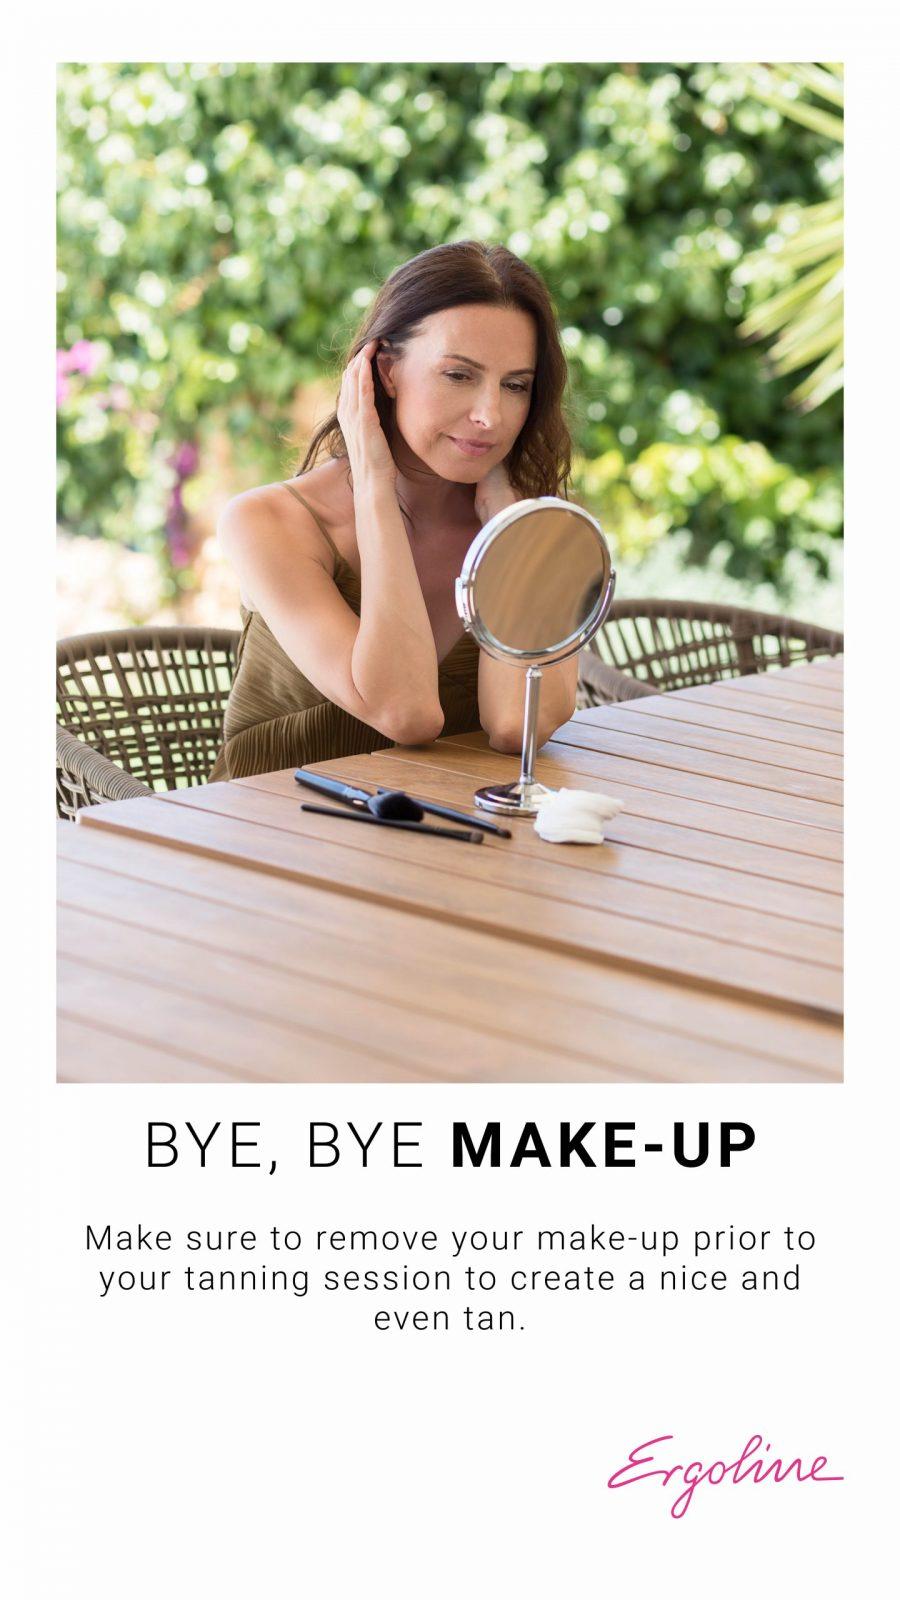 Bye, Bye Make-up